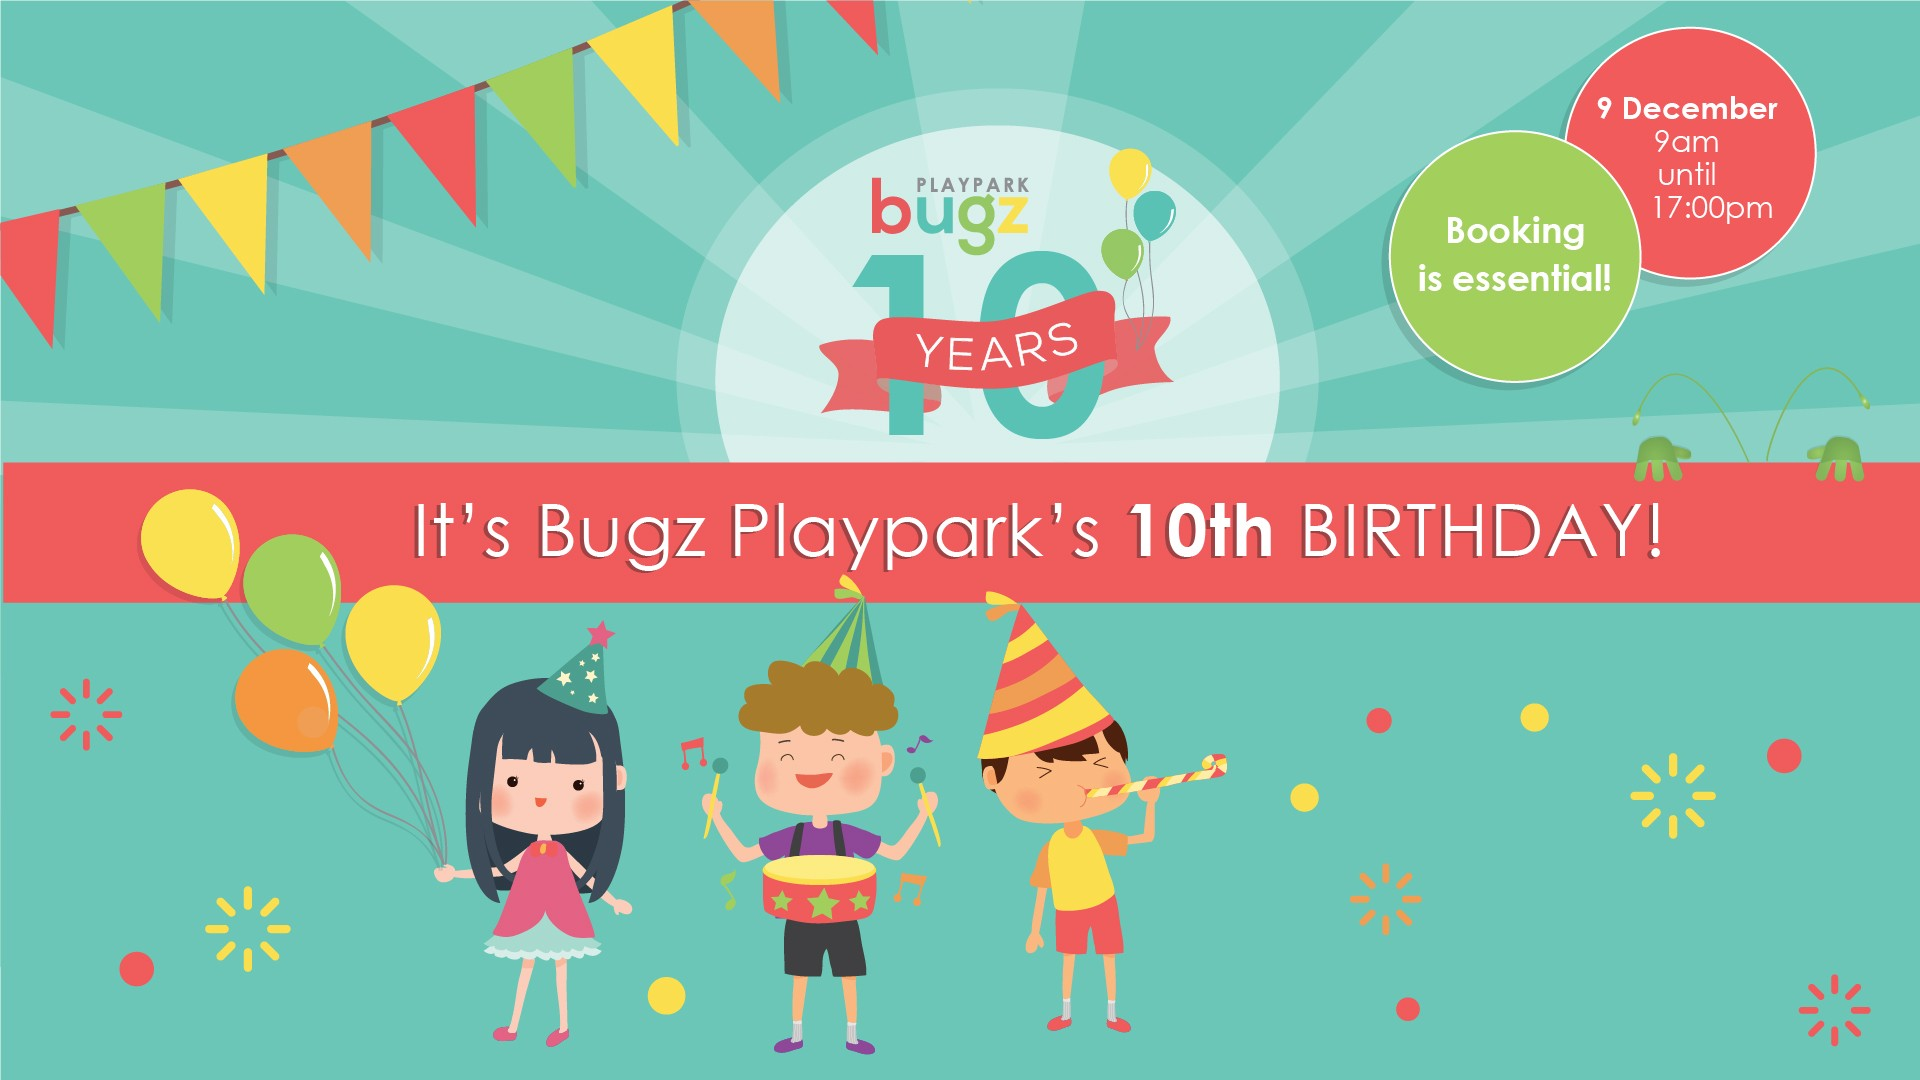 Bugz turns 10!